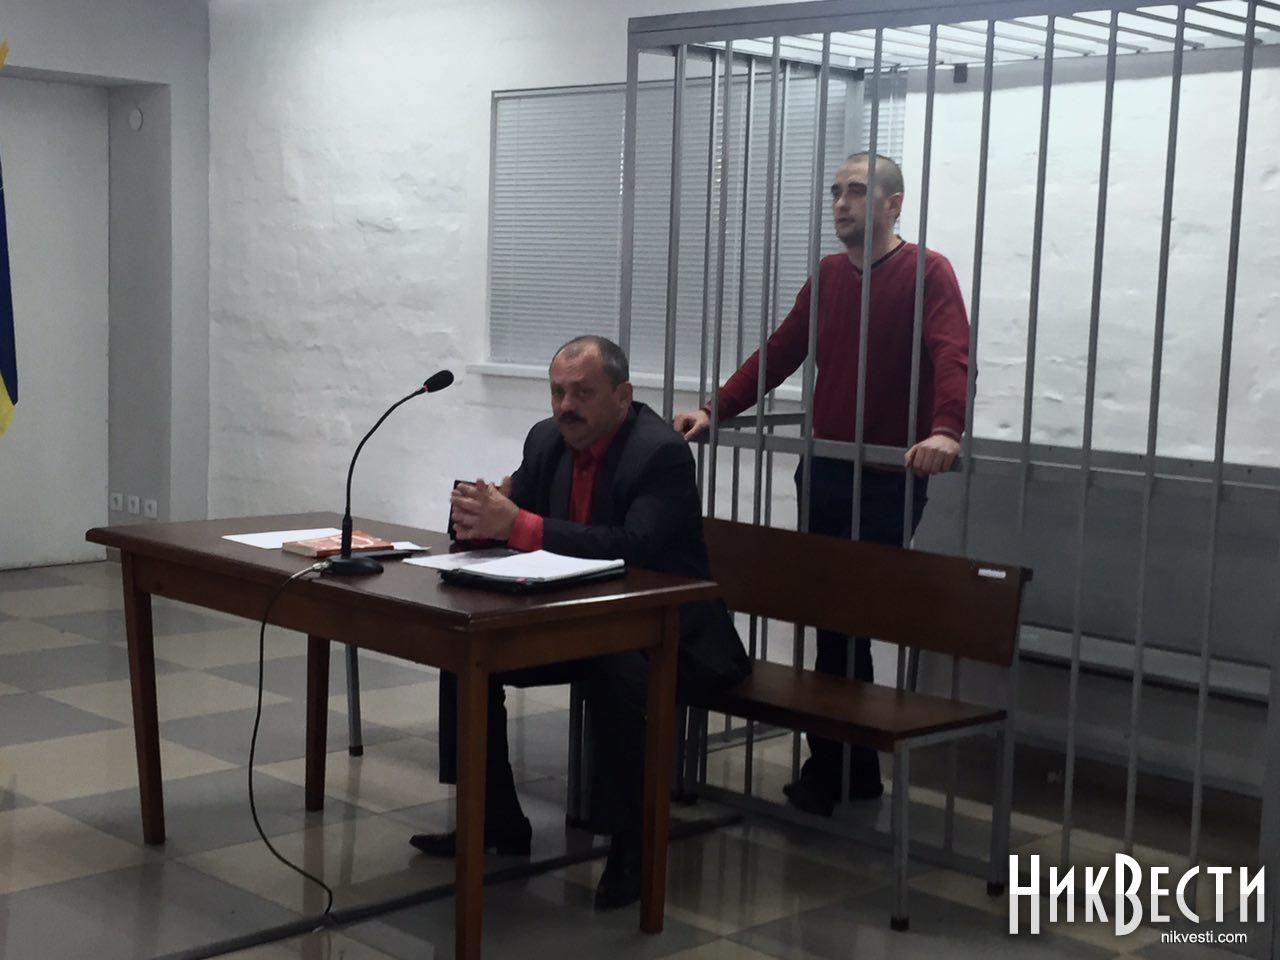 Катастрофа вКривом Озере: суд продлил арест двоим полицейским